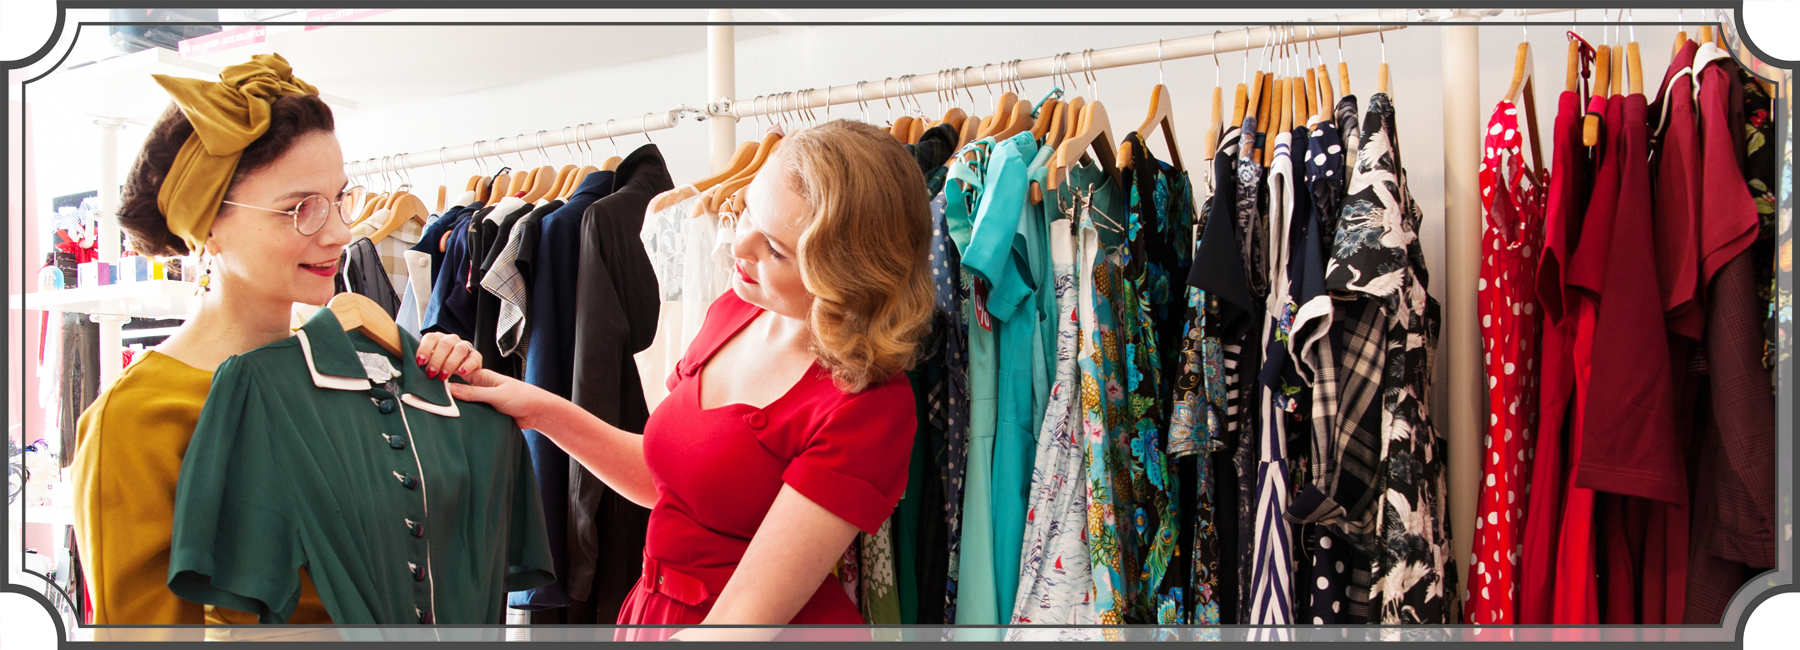 Kleider im Vintage-Stil